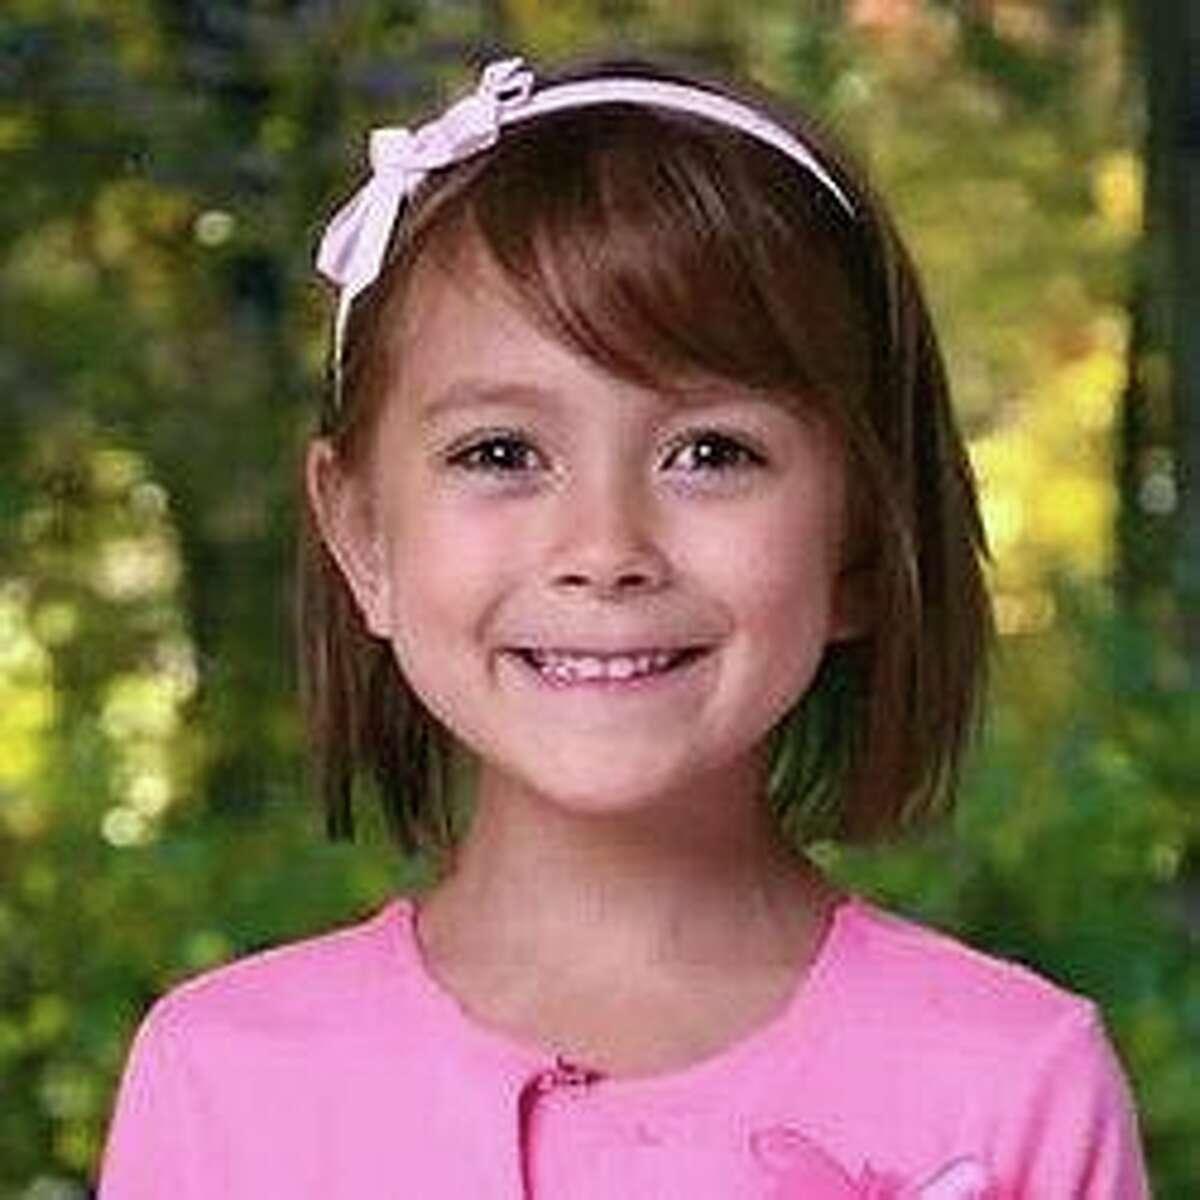 Madeleine F. Hsu - Sandy Hook Massacre Victim